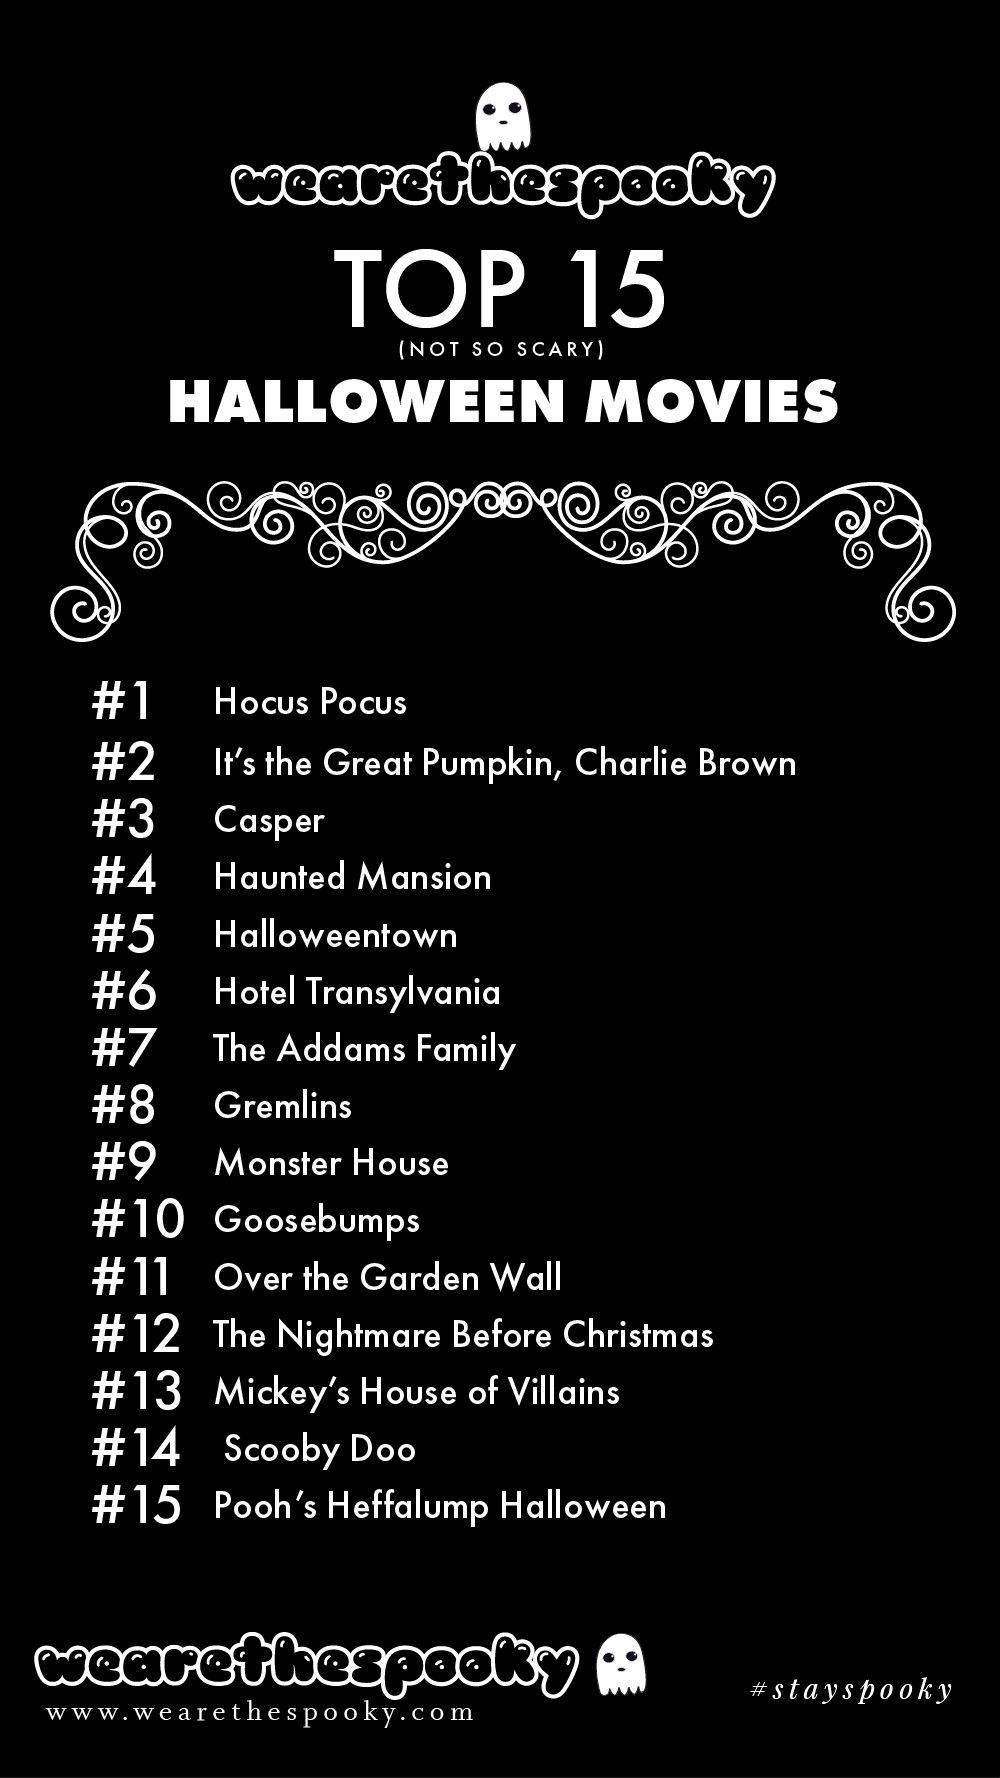 Wearethespooky's Not So Scary Halloween Movie List